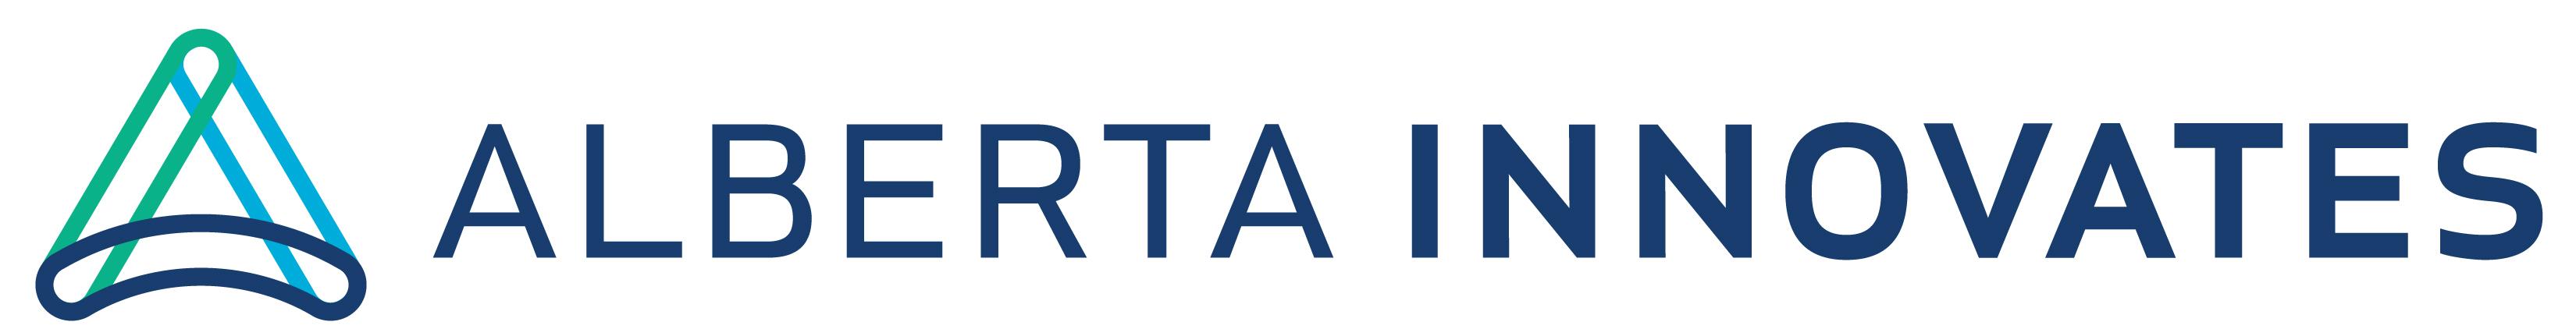 Alberta Innovates horizontal logo